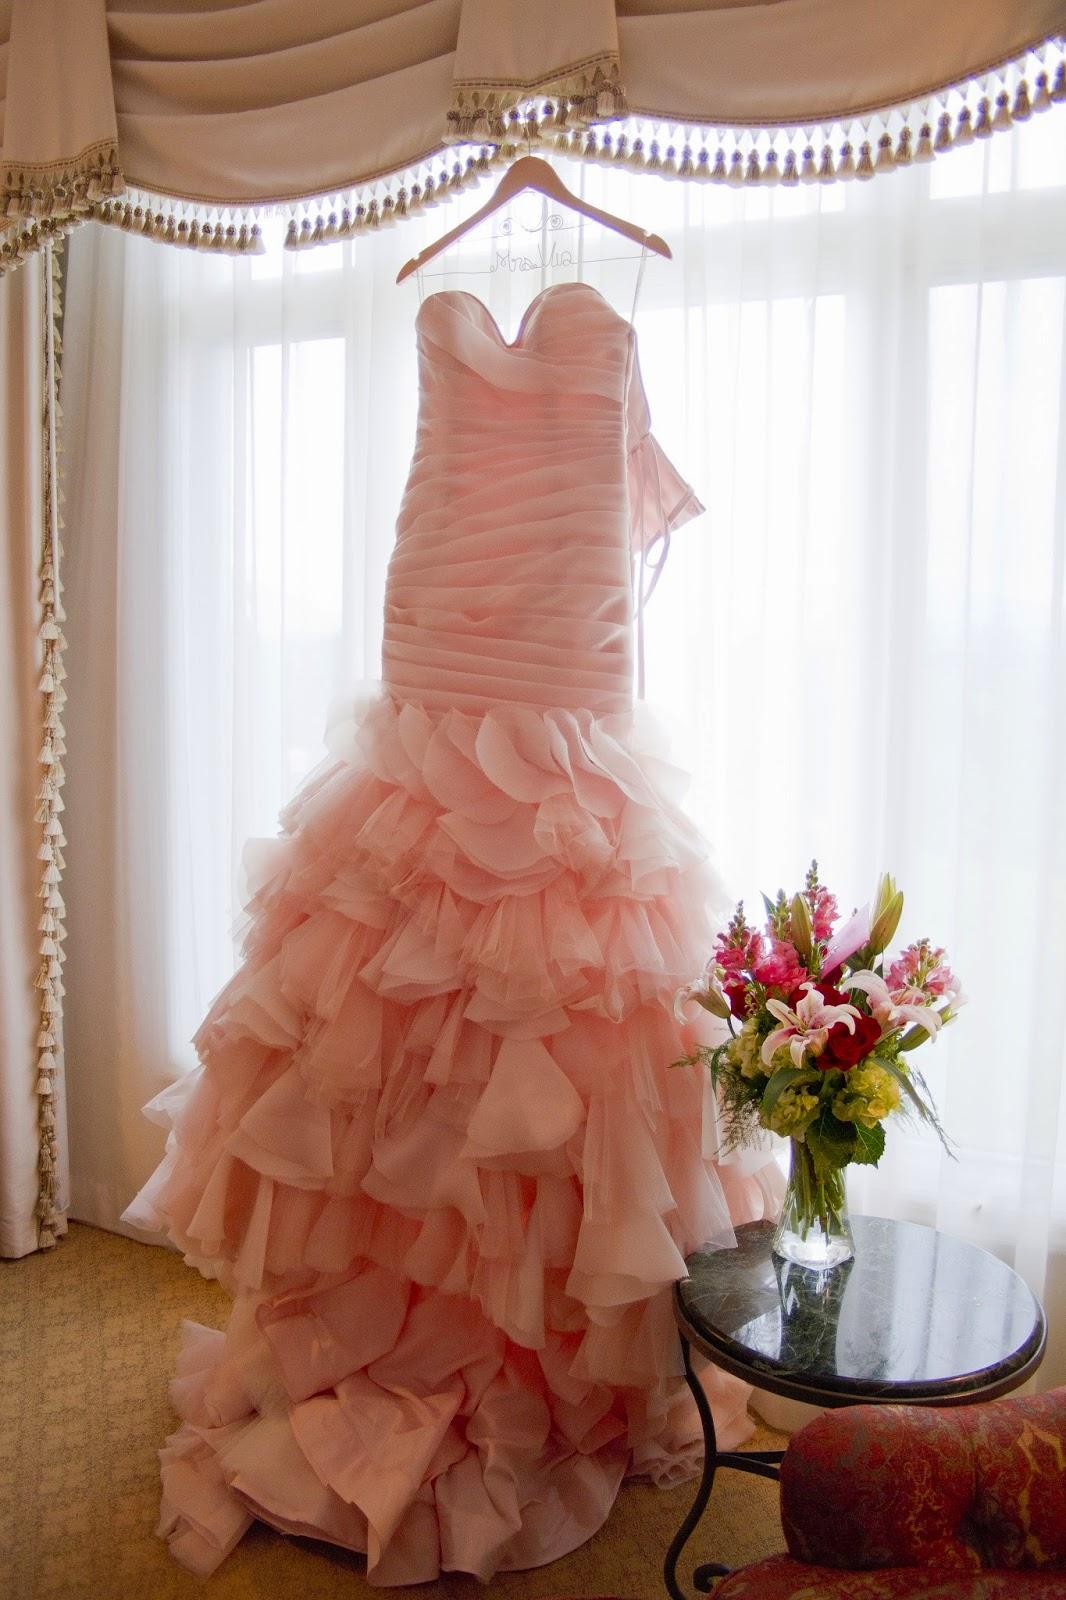 Beau tied affair danielle michael biltmore bliss for Wedding dresses lynchburg va